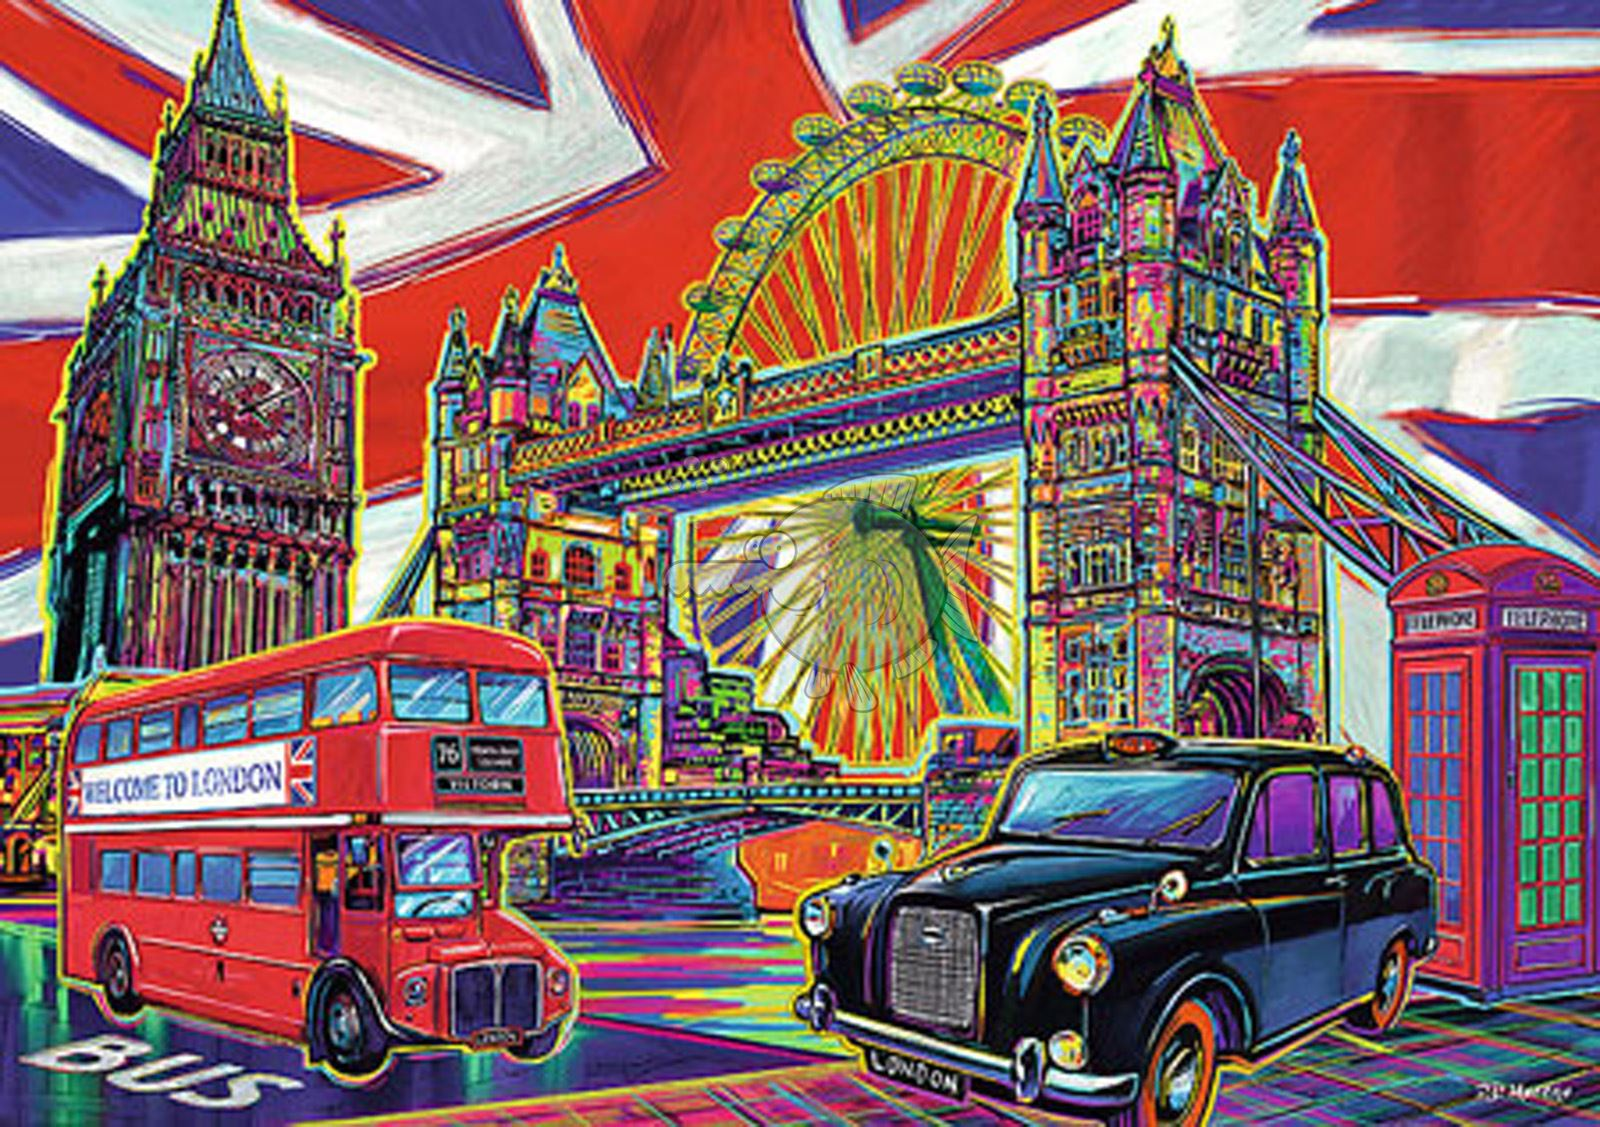 Trefl-300-500-1000-1500-2000-3000-4000-6000-Piece-Jigsaw-Puzzle-Landscapes-City thumbnail 82